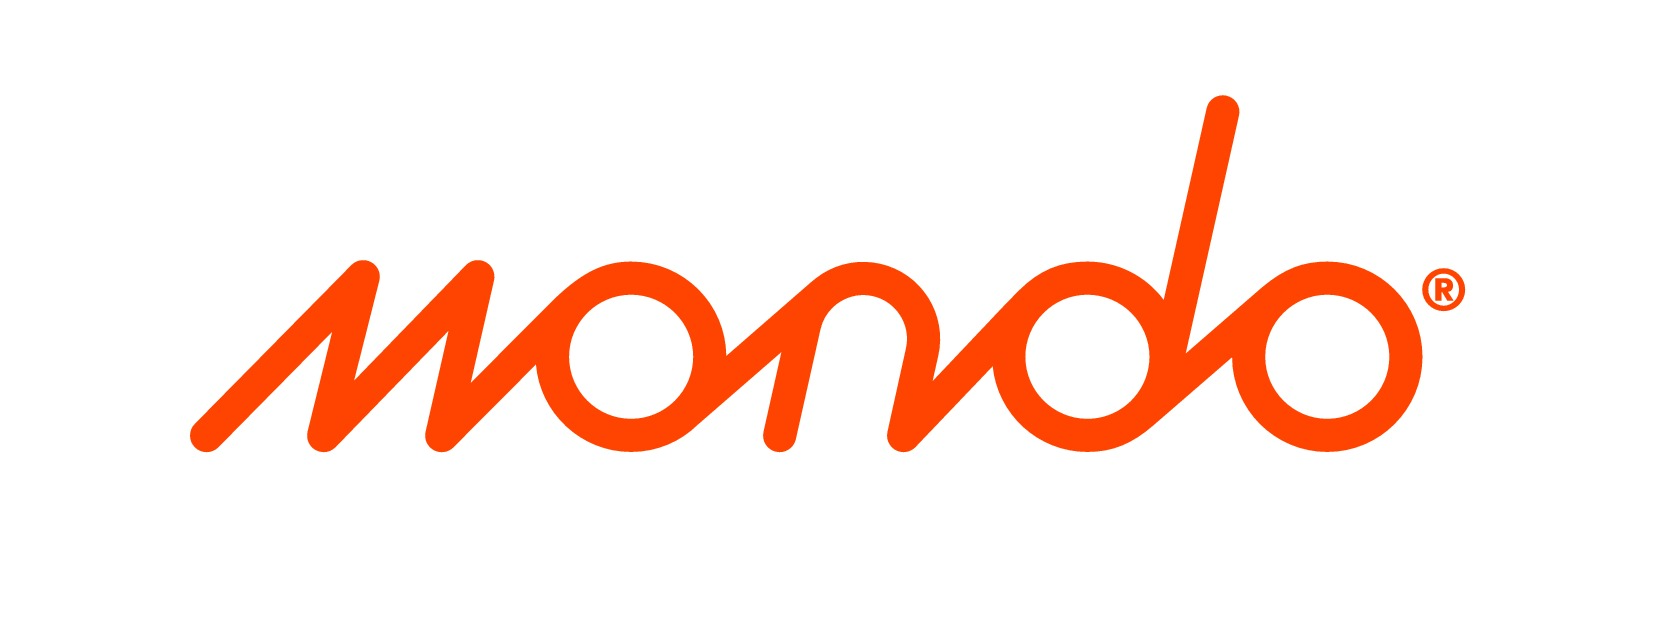 Mondo_Brand_Mark_CMYK_Mondo.eps_.jpg